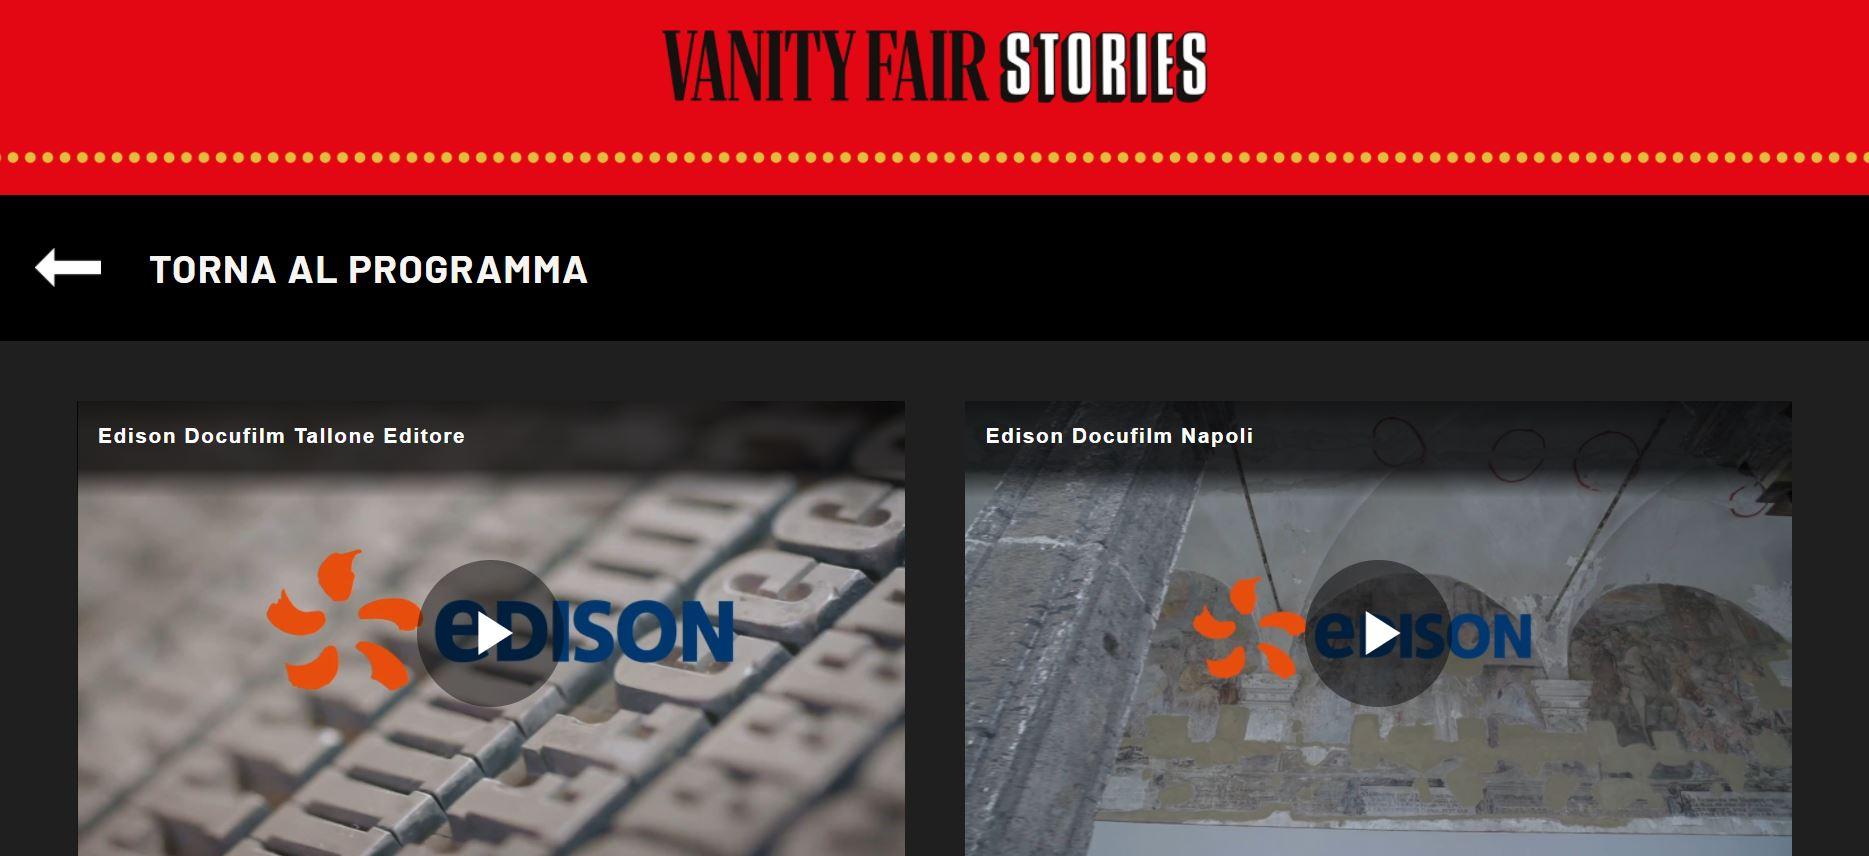 Edison VFS - Benedetta Malavasi - Italy - Vanity Fair Stories - Sponsor 1